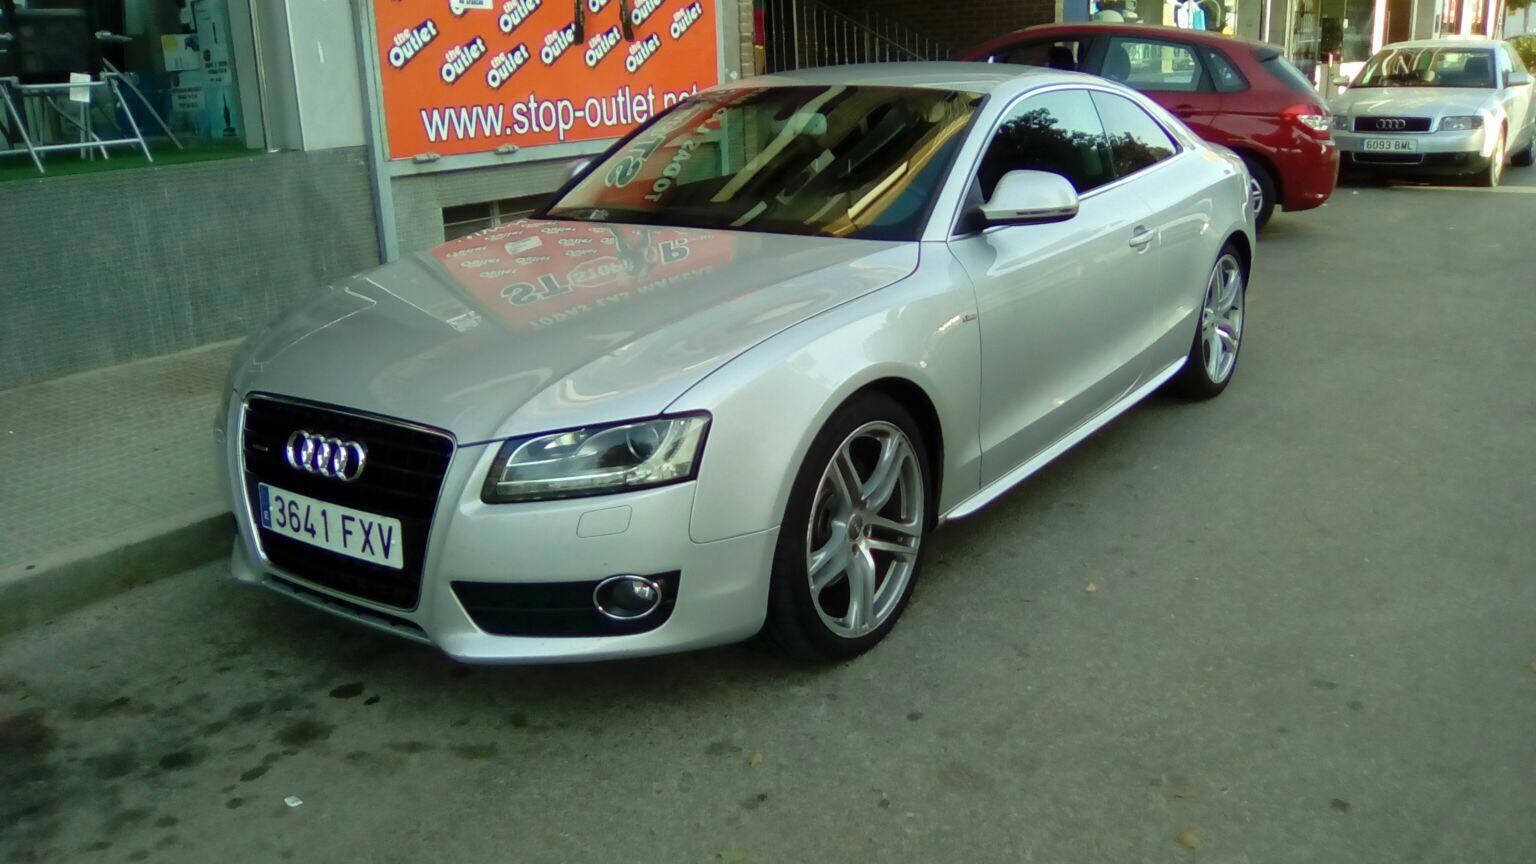 Audi A5 Coupé 3.0TDI quattro